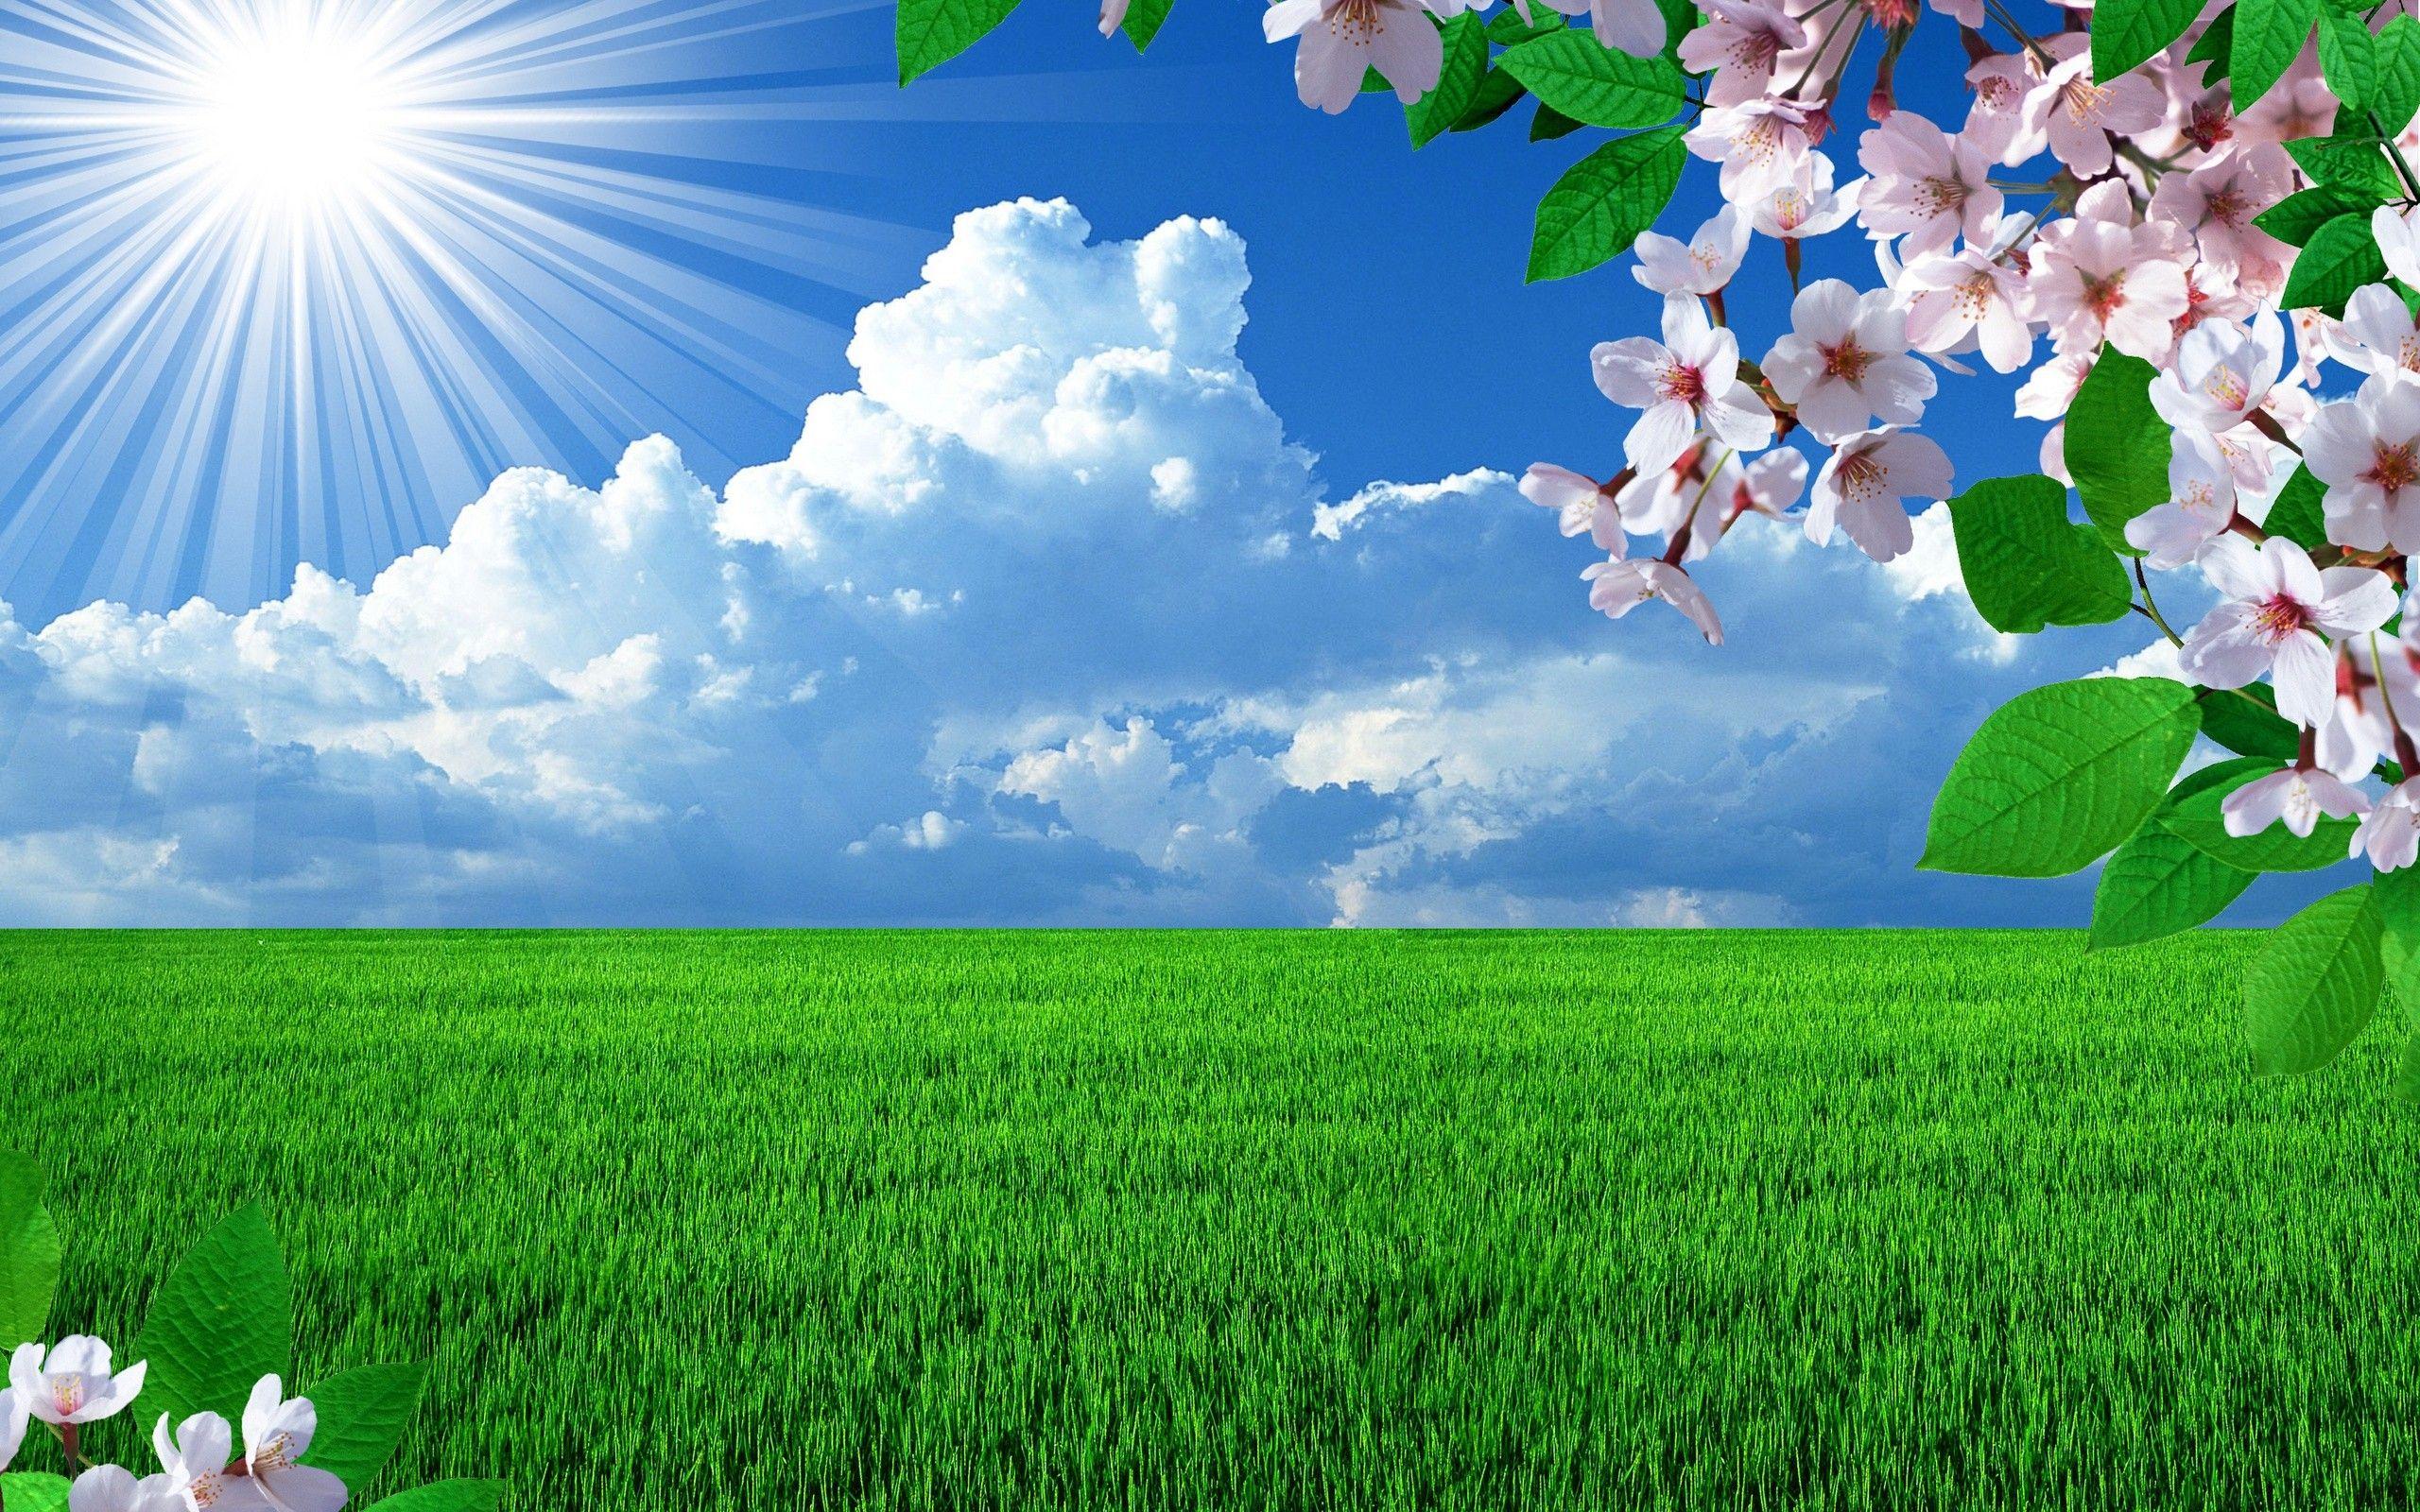 Nature Wallpaper 2560x1600 38815 Beautiful Nature Wallpaper Beautiful Nature Spring Beautiful Nature